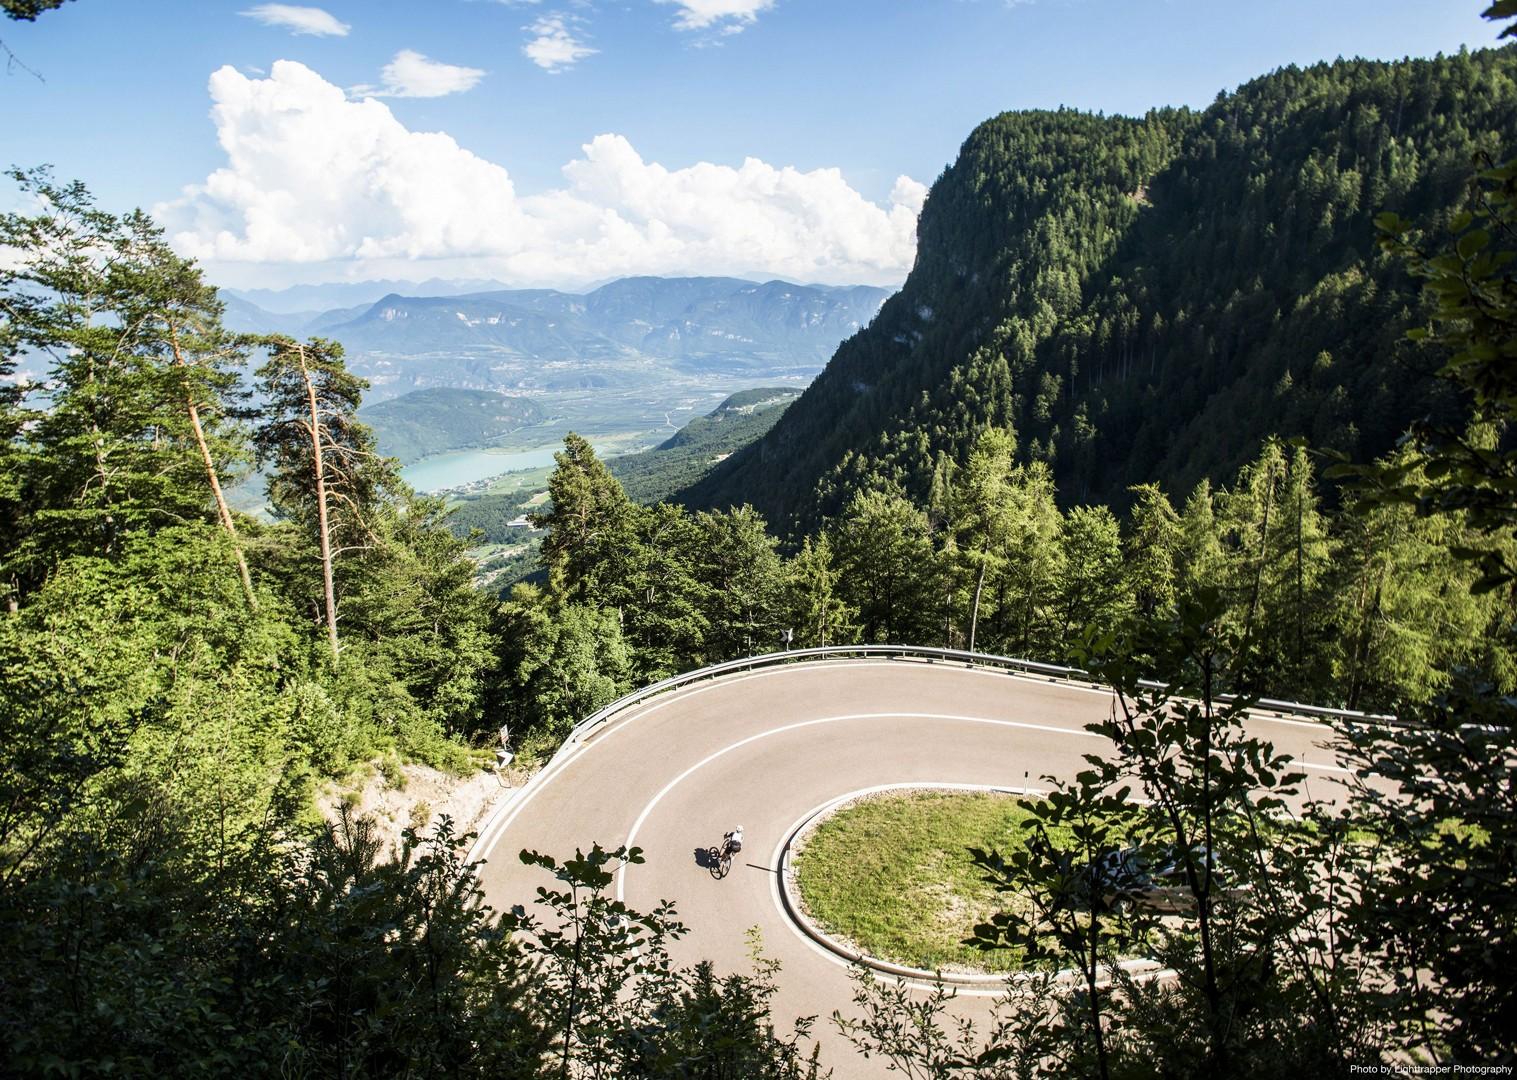 guided-road-cycling-holiday-italy-italian-alps.jpg - Italy - Italian Alps Introduction - Guided Road Cycling Holiday - Road Cycling